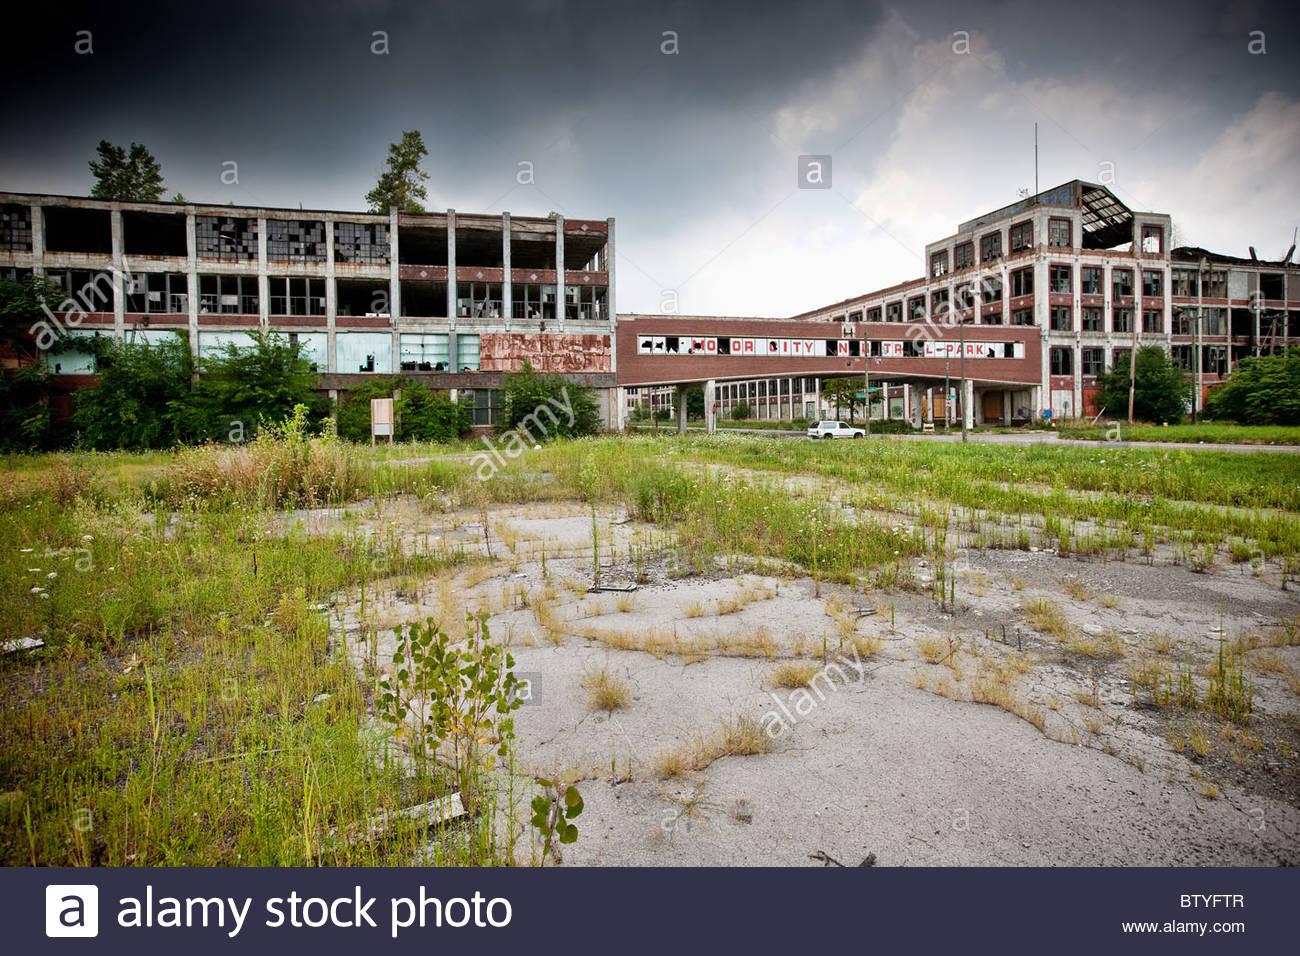 Detroit, Michigan, USA. Derelict buildings in Detroit. - Stock Image